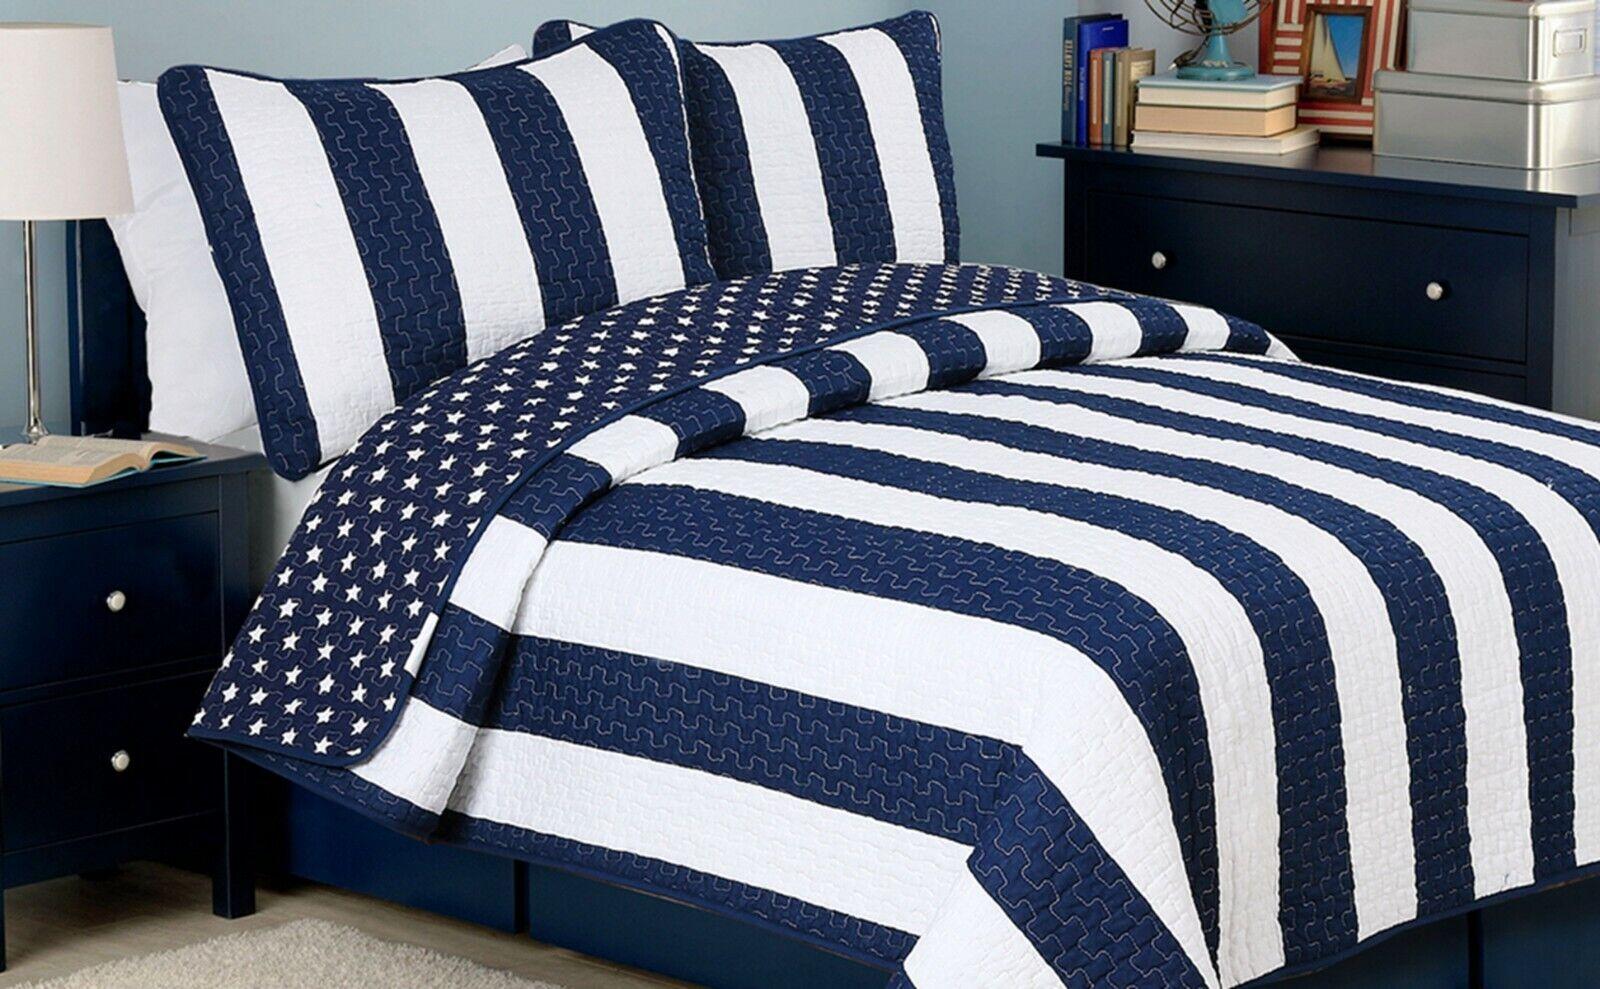 Ameristar Sailor Reversible Cotton Quilt Set, Bedspreads, Coverlet